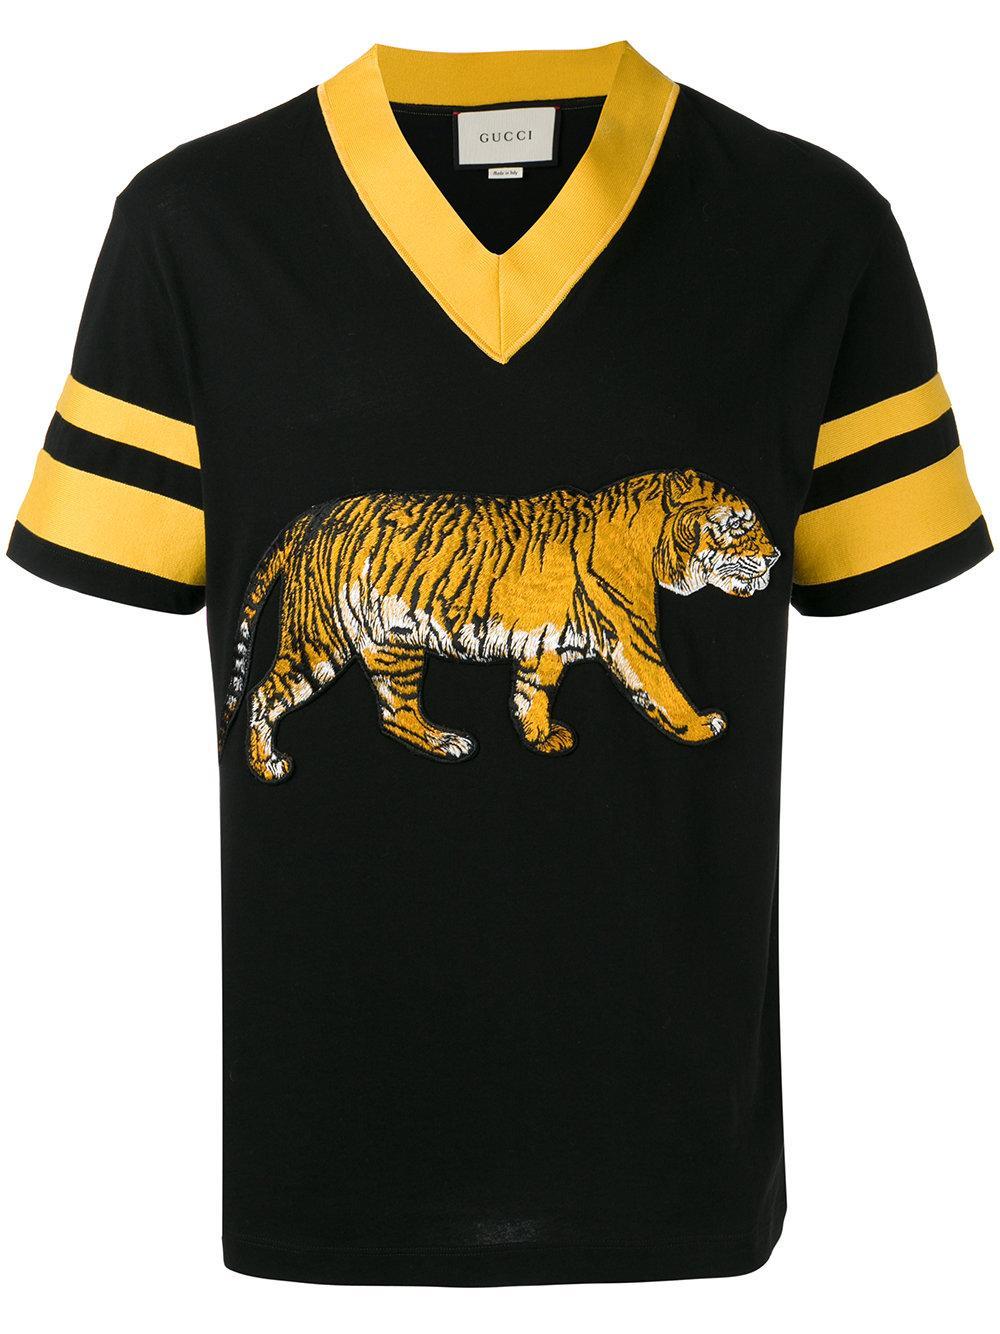 Tiger Stripes Featuring Hanna Haïs - Consecration